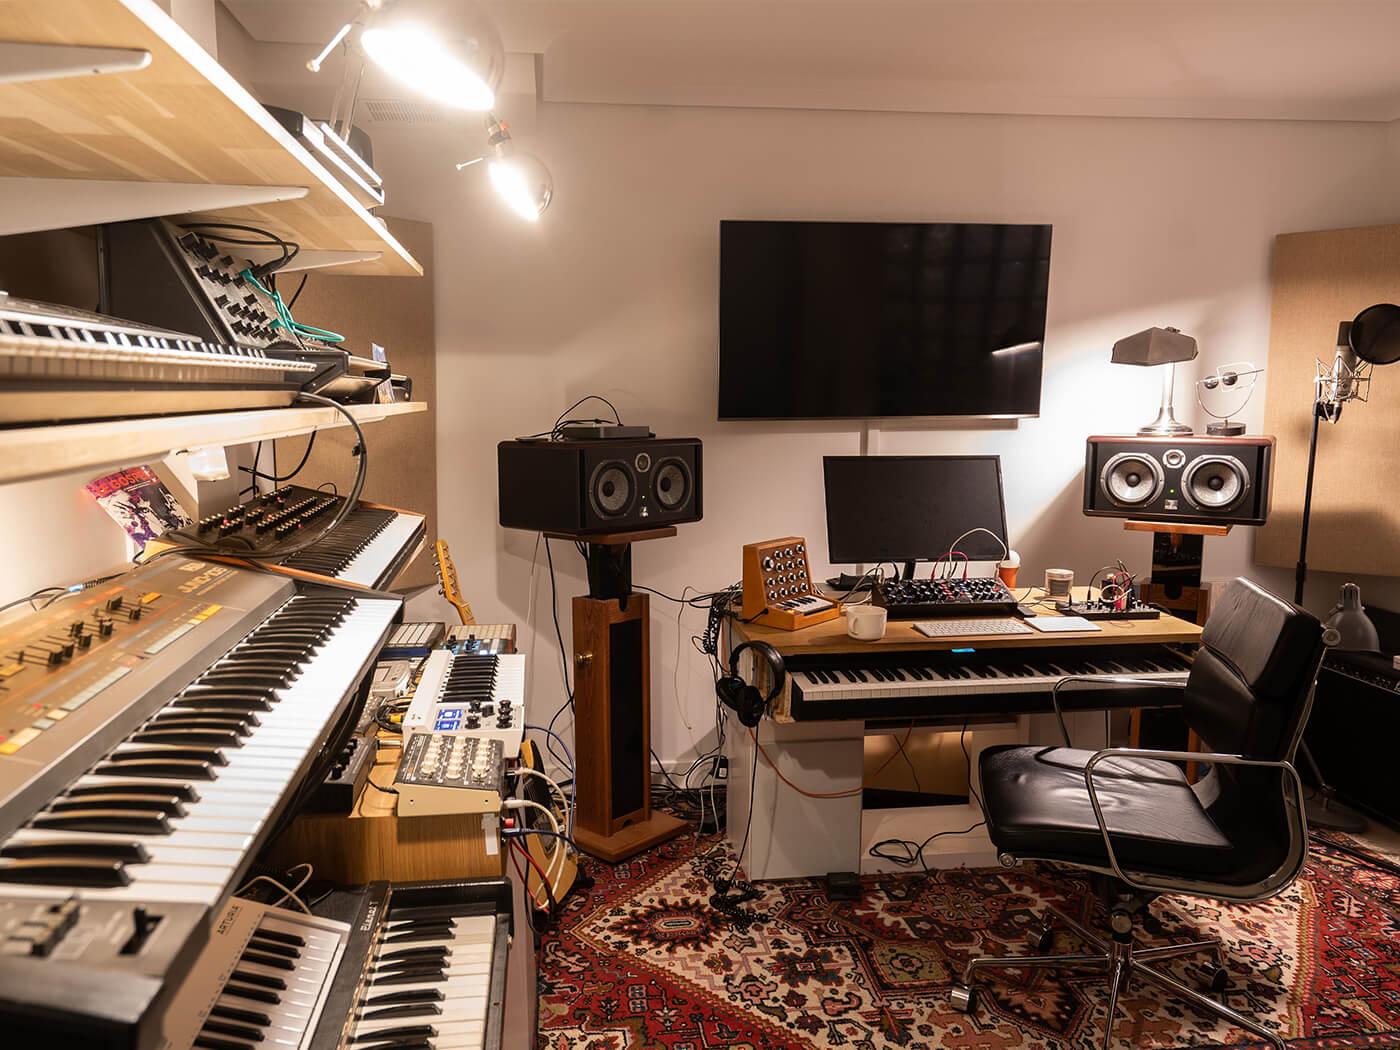 Saycet studio